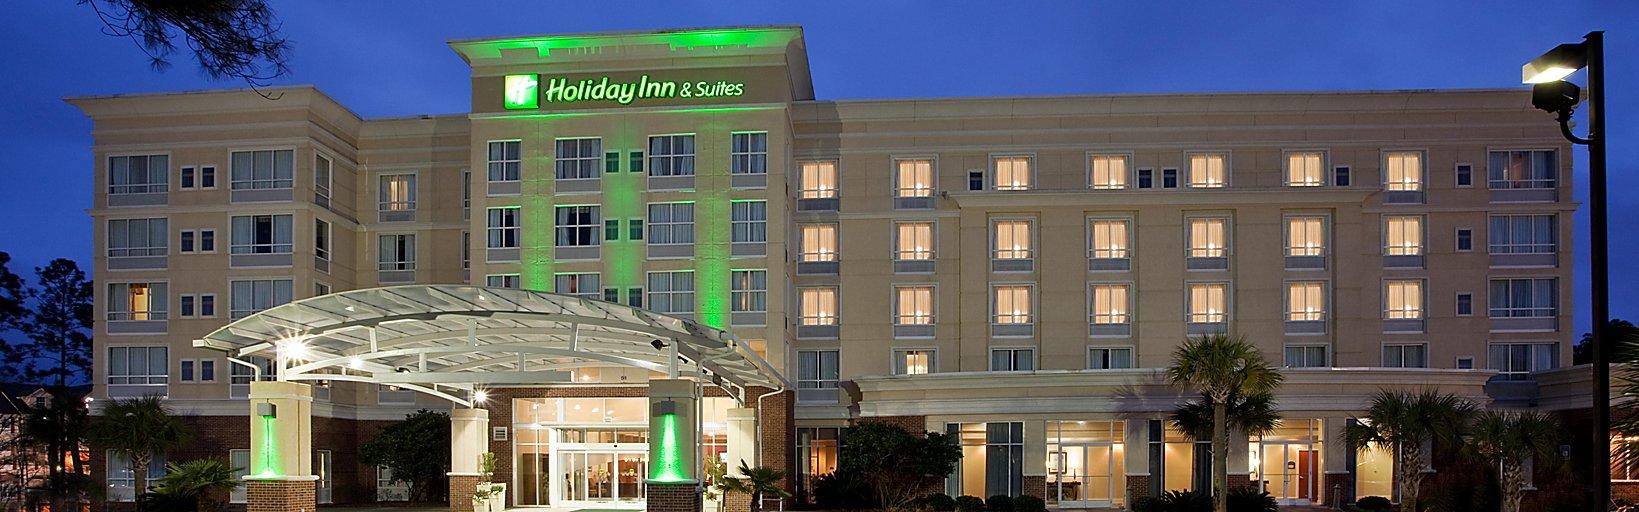 Holiday Inn Brunswick I 95 Exit 38 Hotel By Ihg